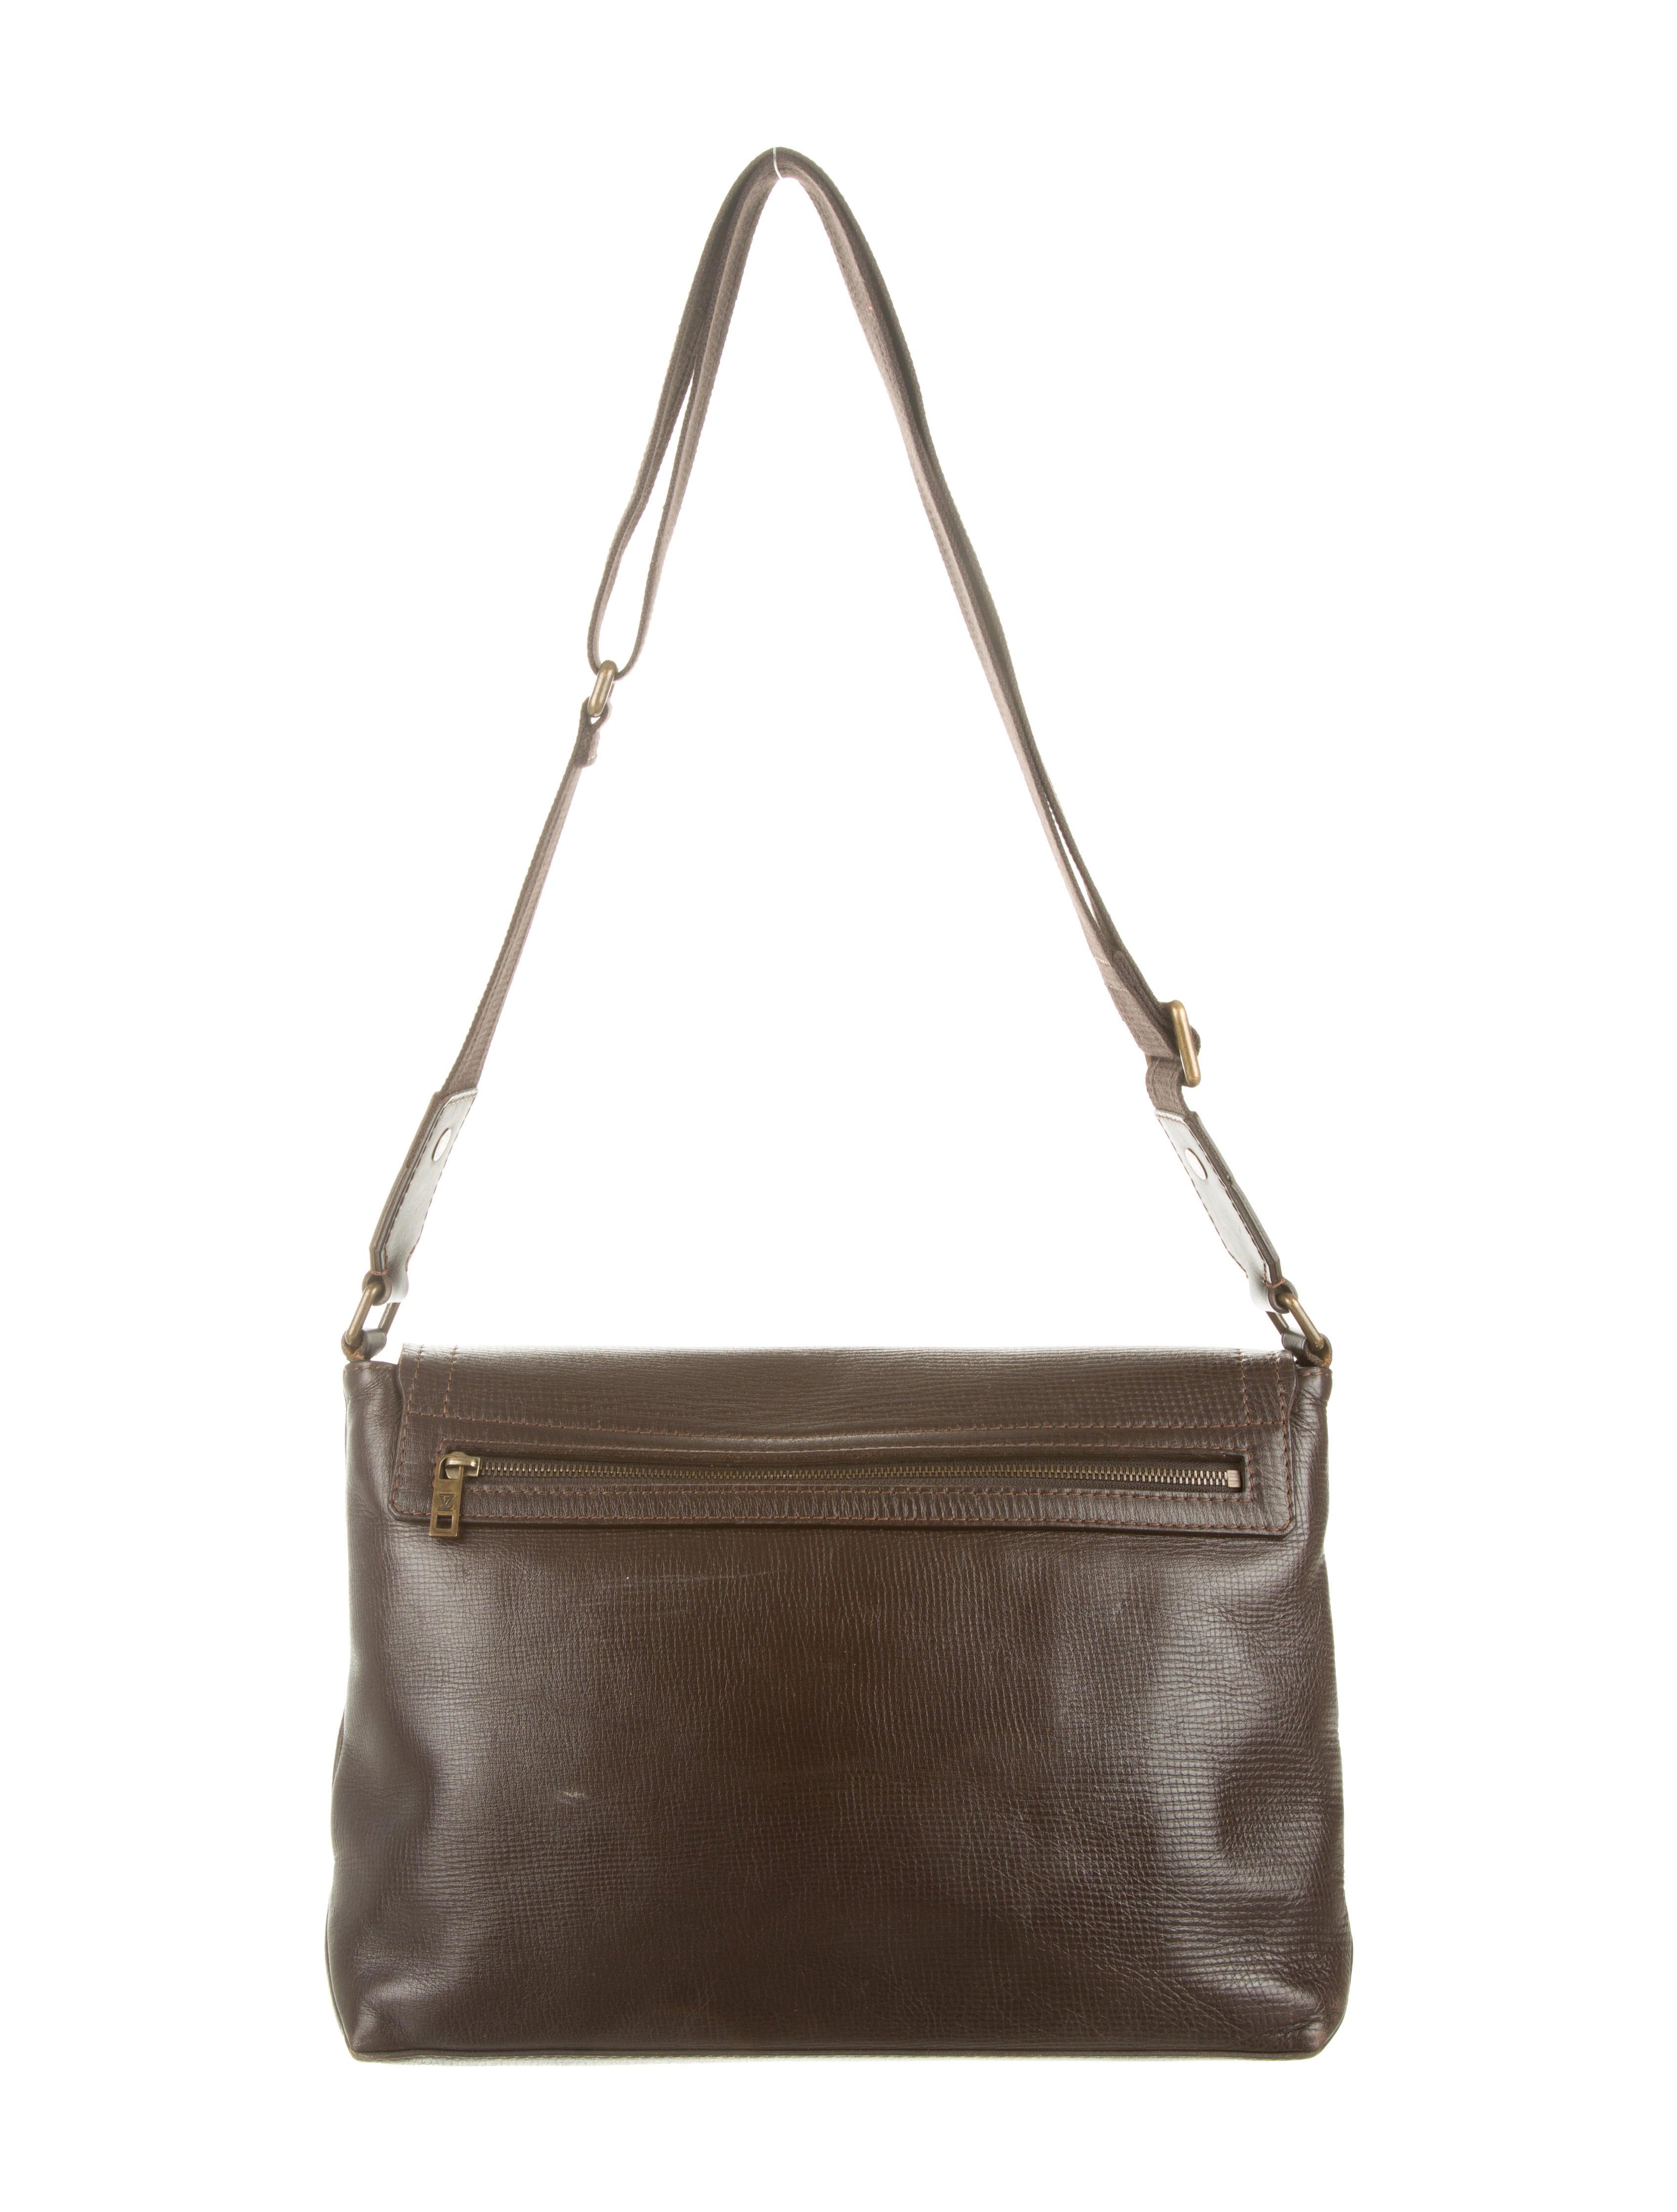 Louis Vuitton Utah Omaha Messenger Bag Bags Lou60500 The Realreal